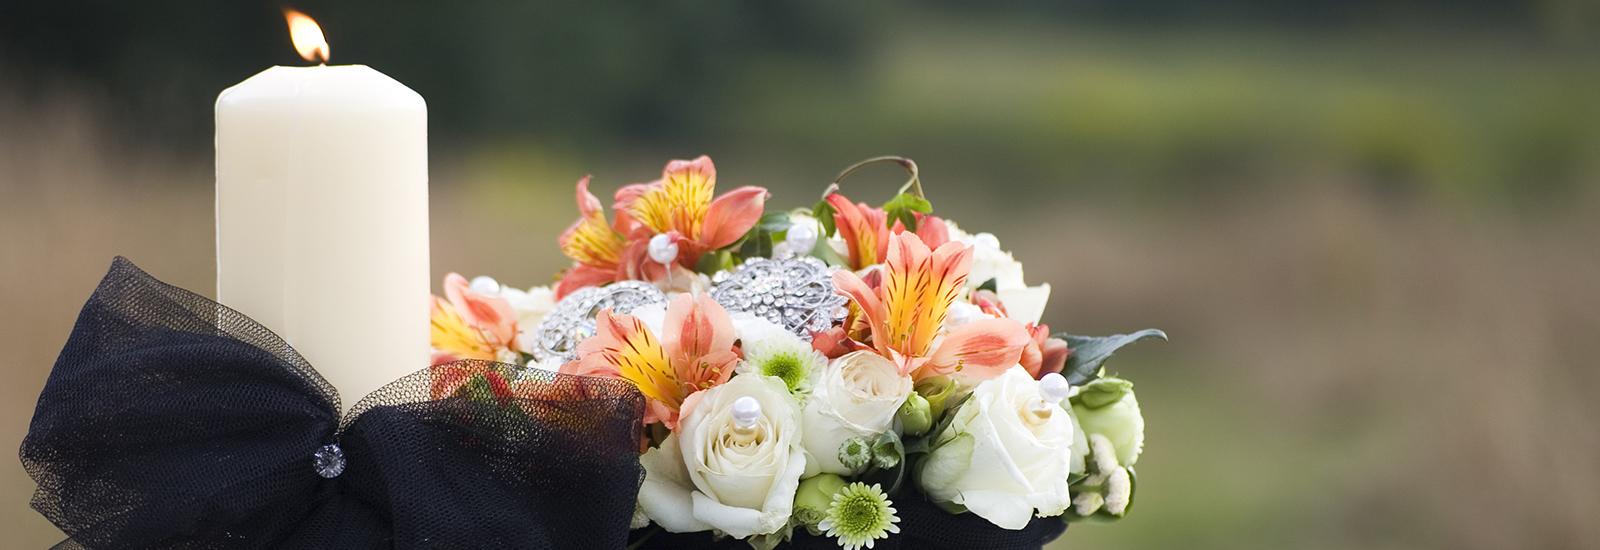 Mainland Funerals Plans